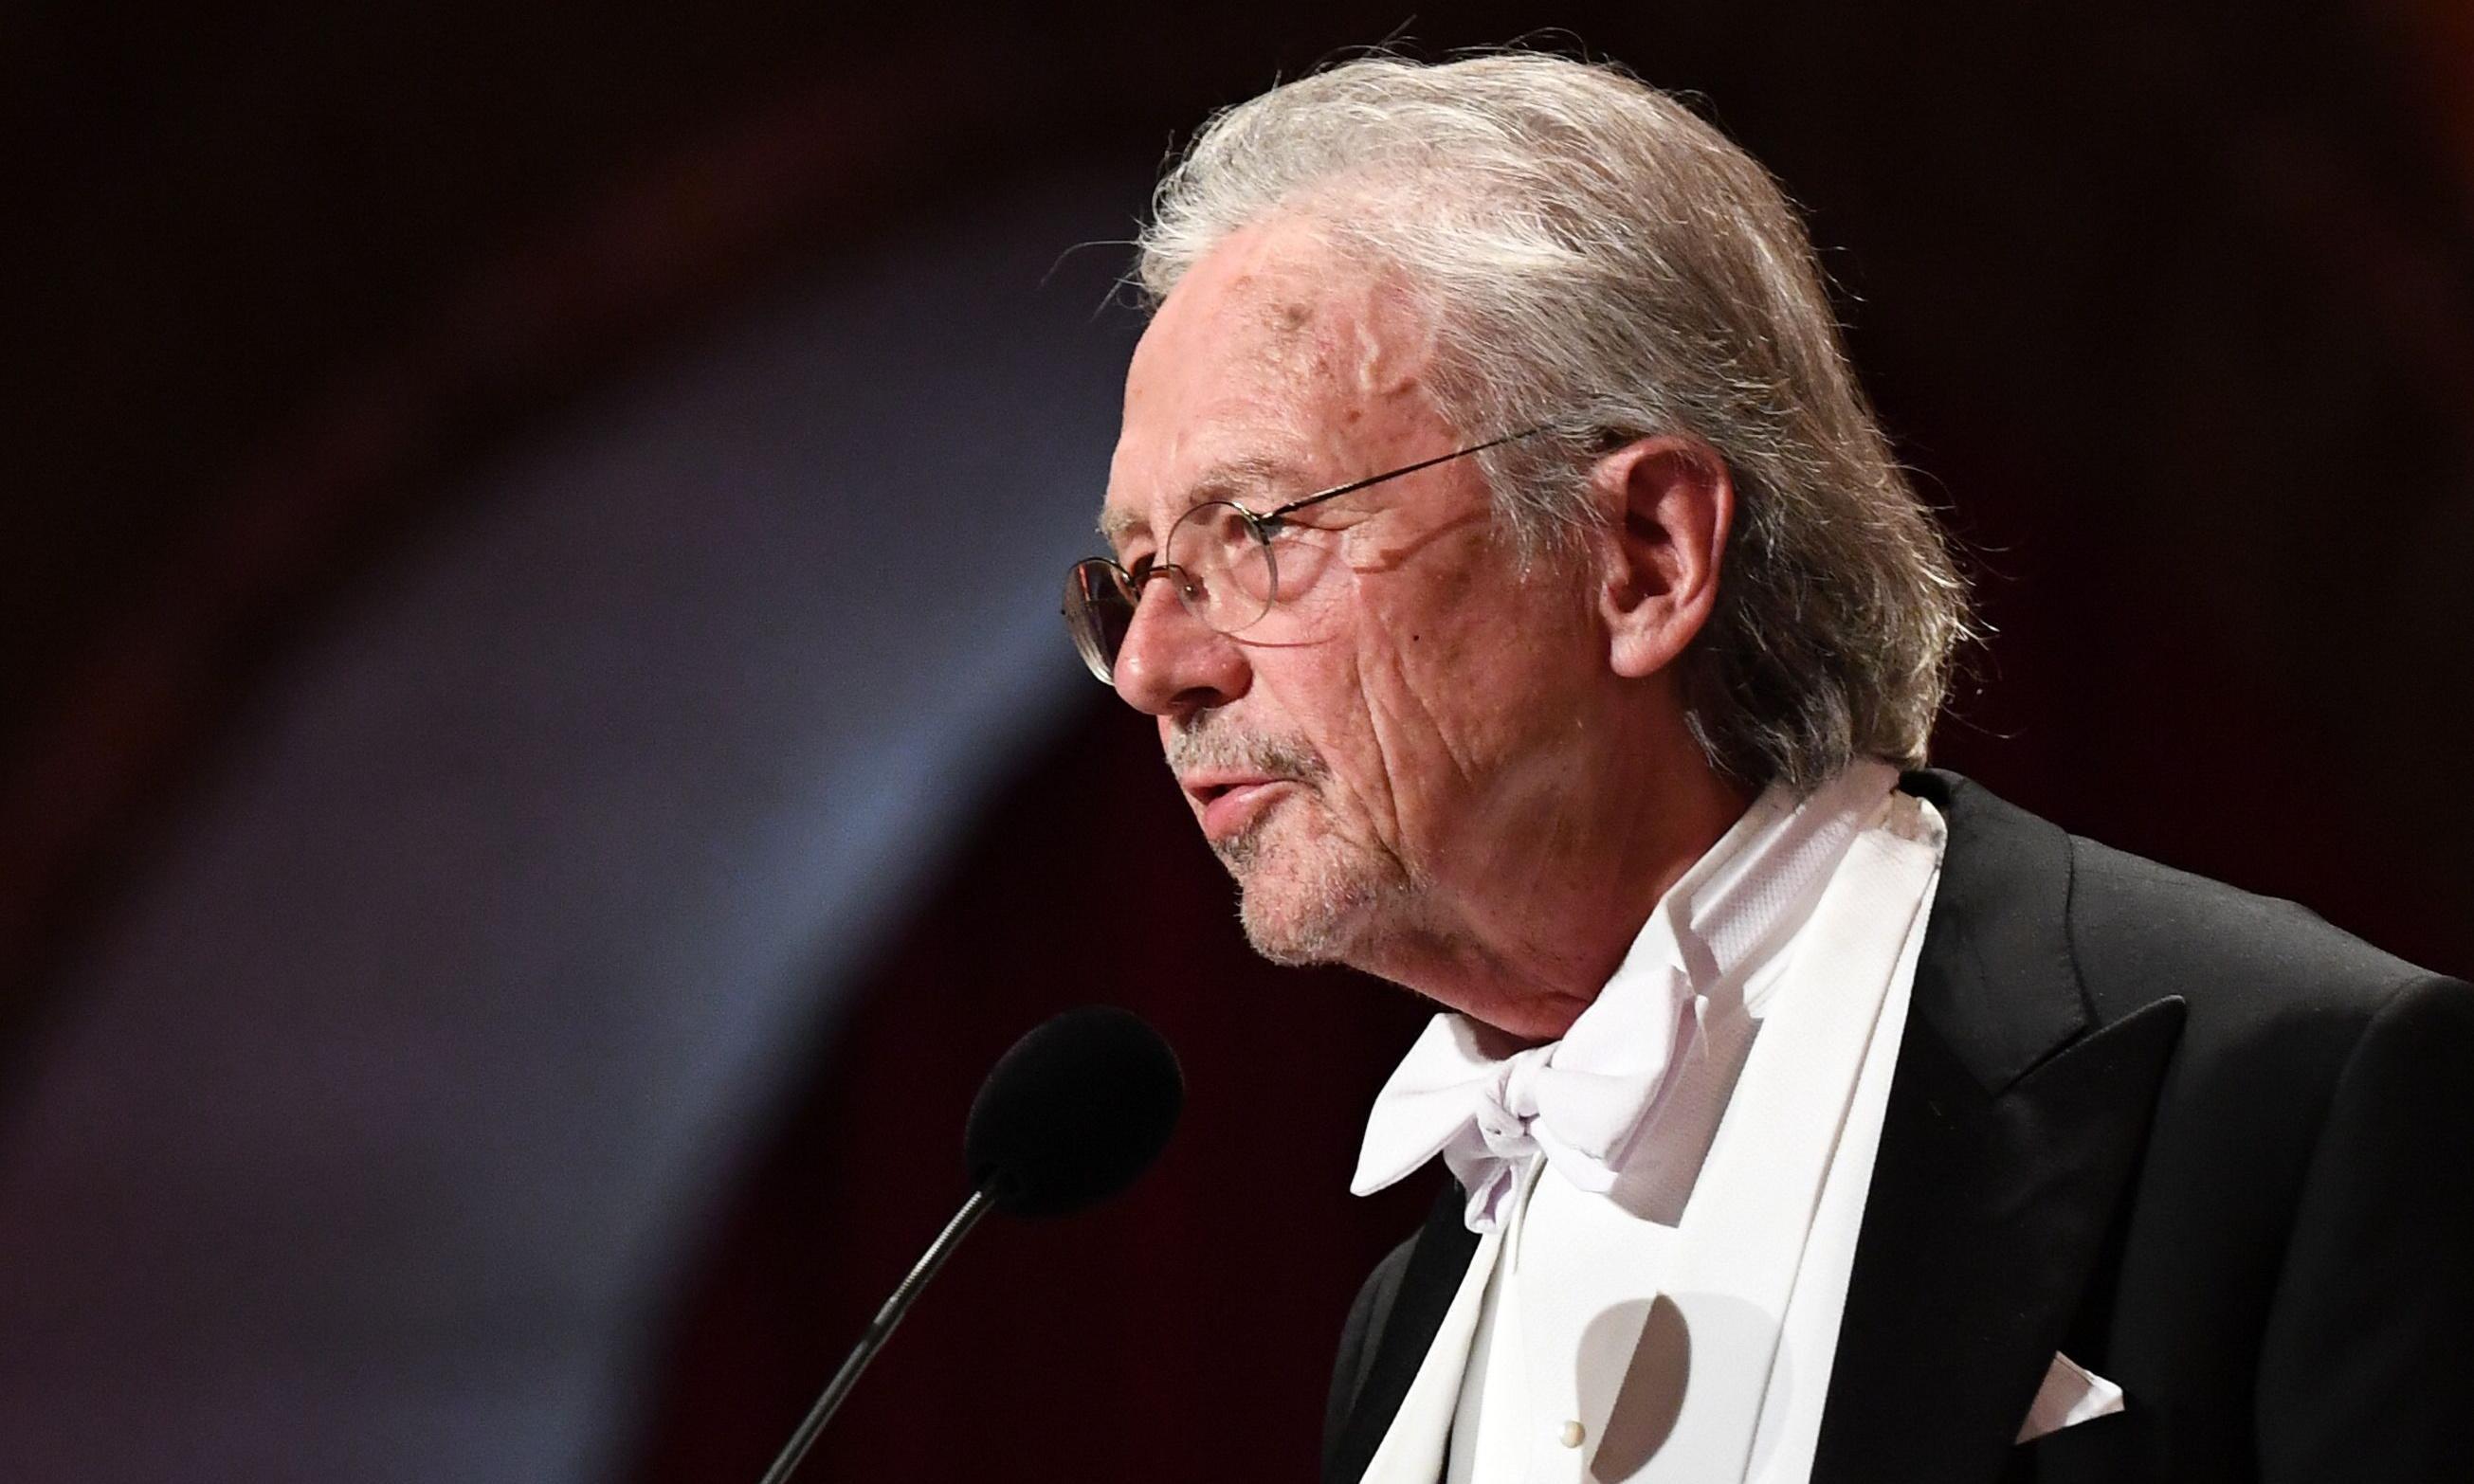 Kosovo declares Nobel laureate Peter Handke persona non grata